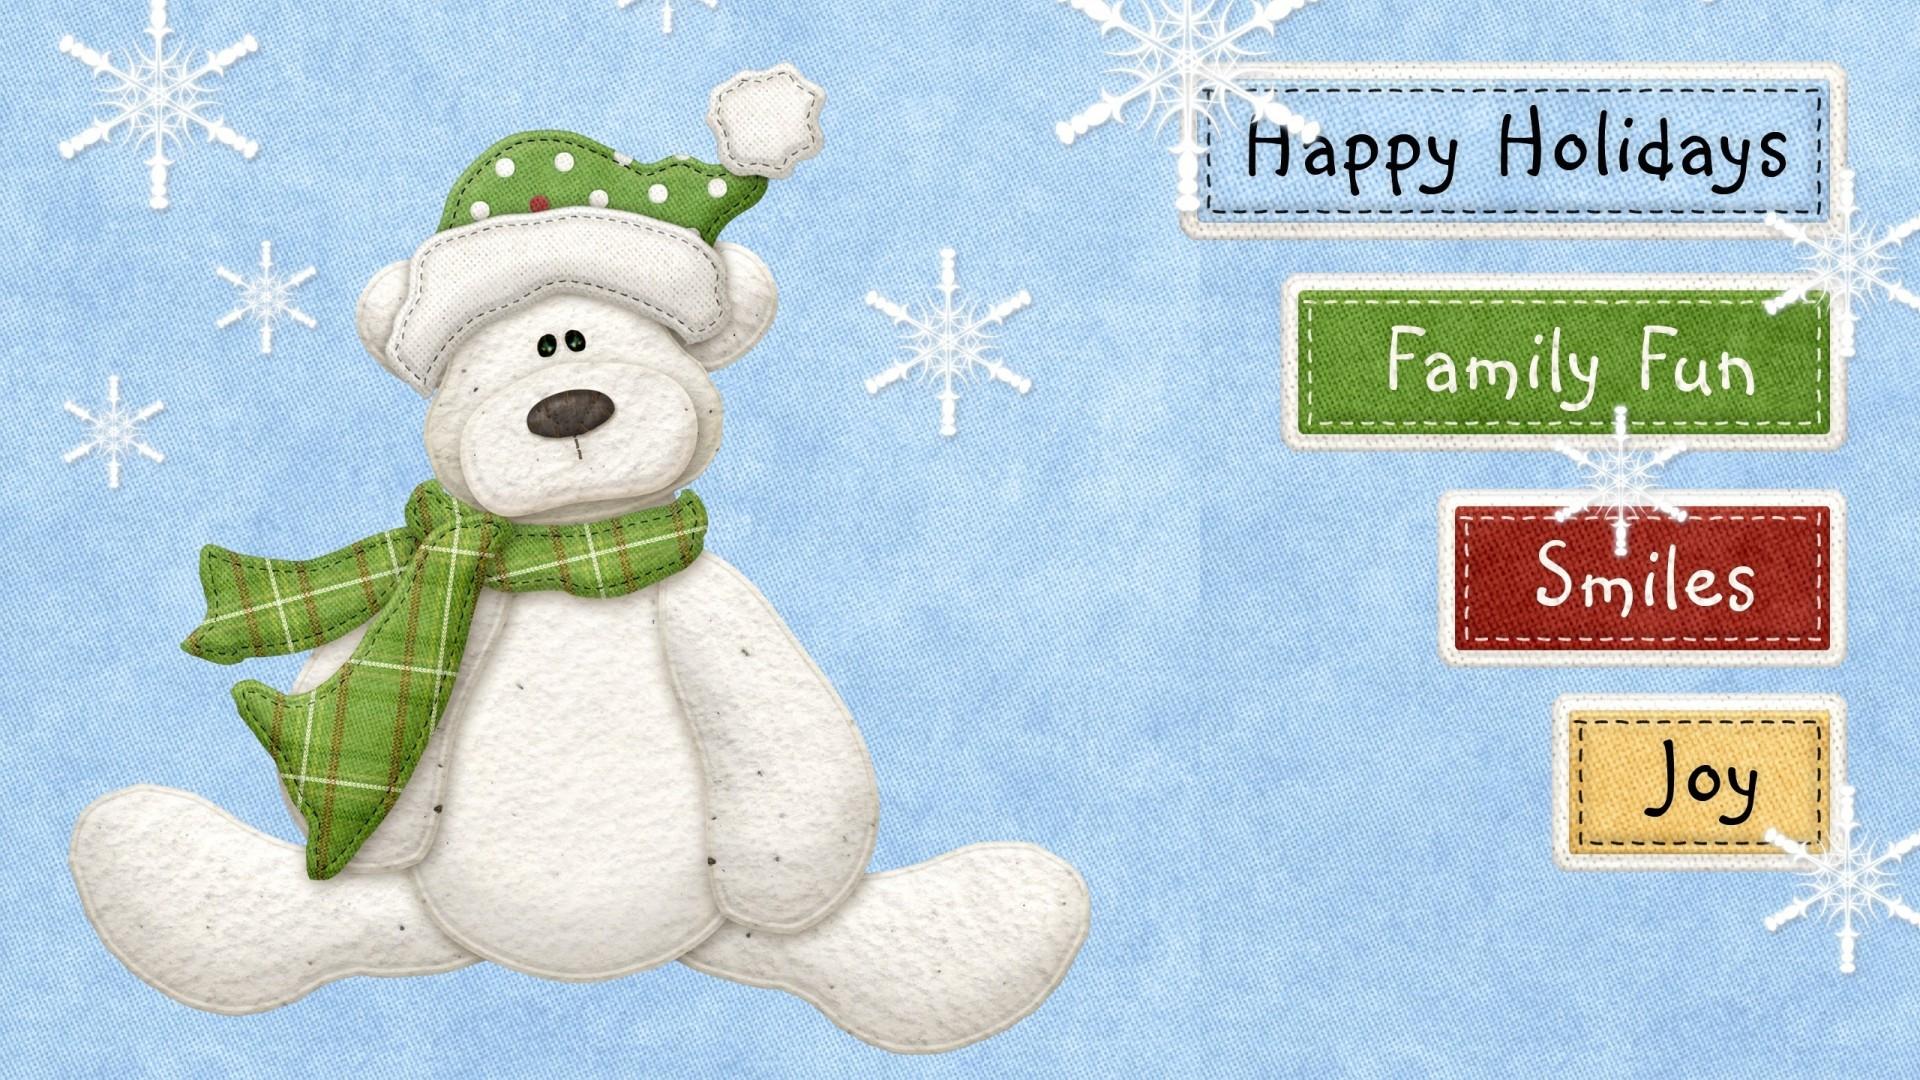 Download Jesus Quotes Wallpapers Happy Holidays Fun Joy Wallpapers Hd Wallpapers Id 19270